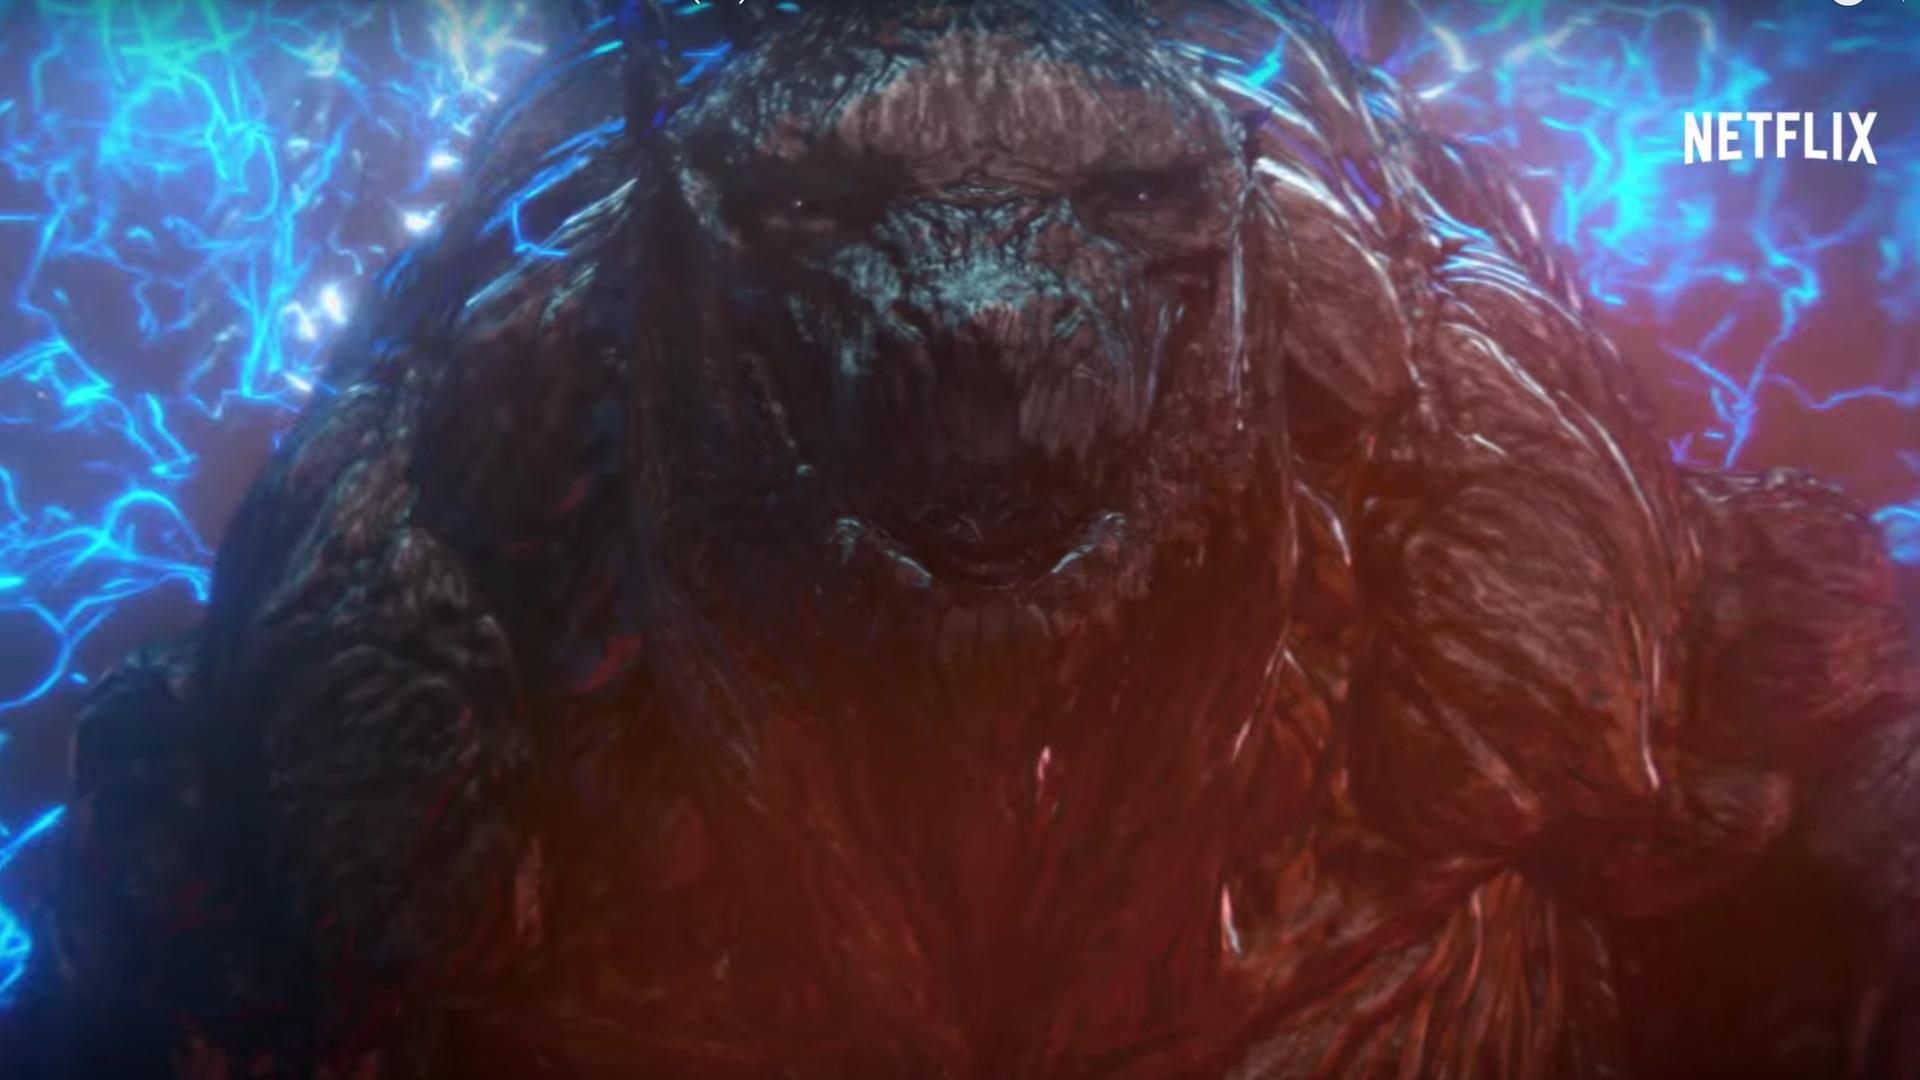 humankind-vs-the-largest-godzilla-ever-in-new-trailer-for-netflixs-godzilla-monster-planet-social.jpg